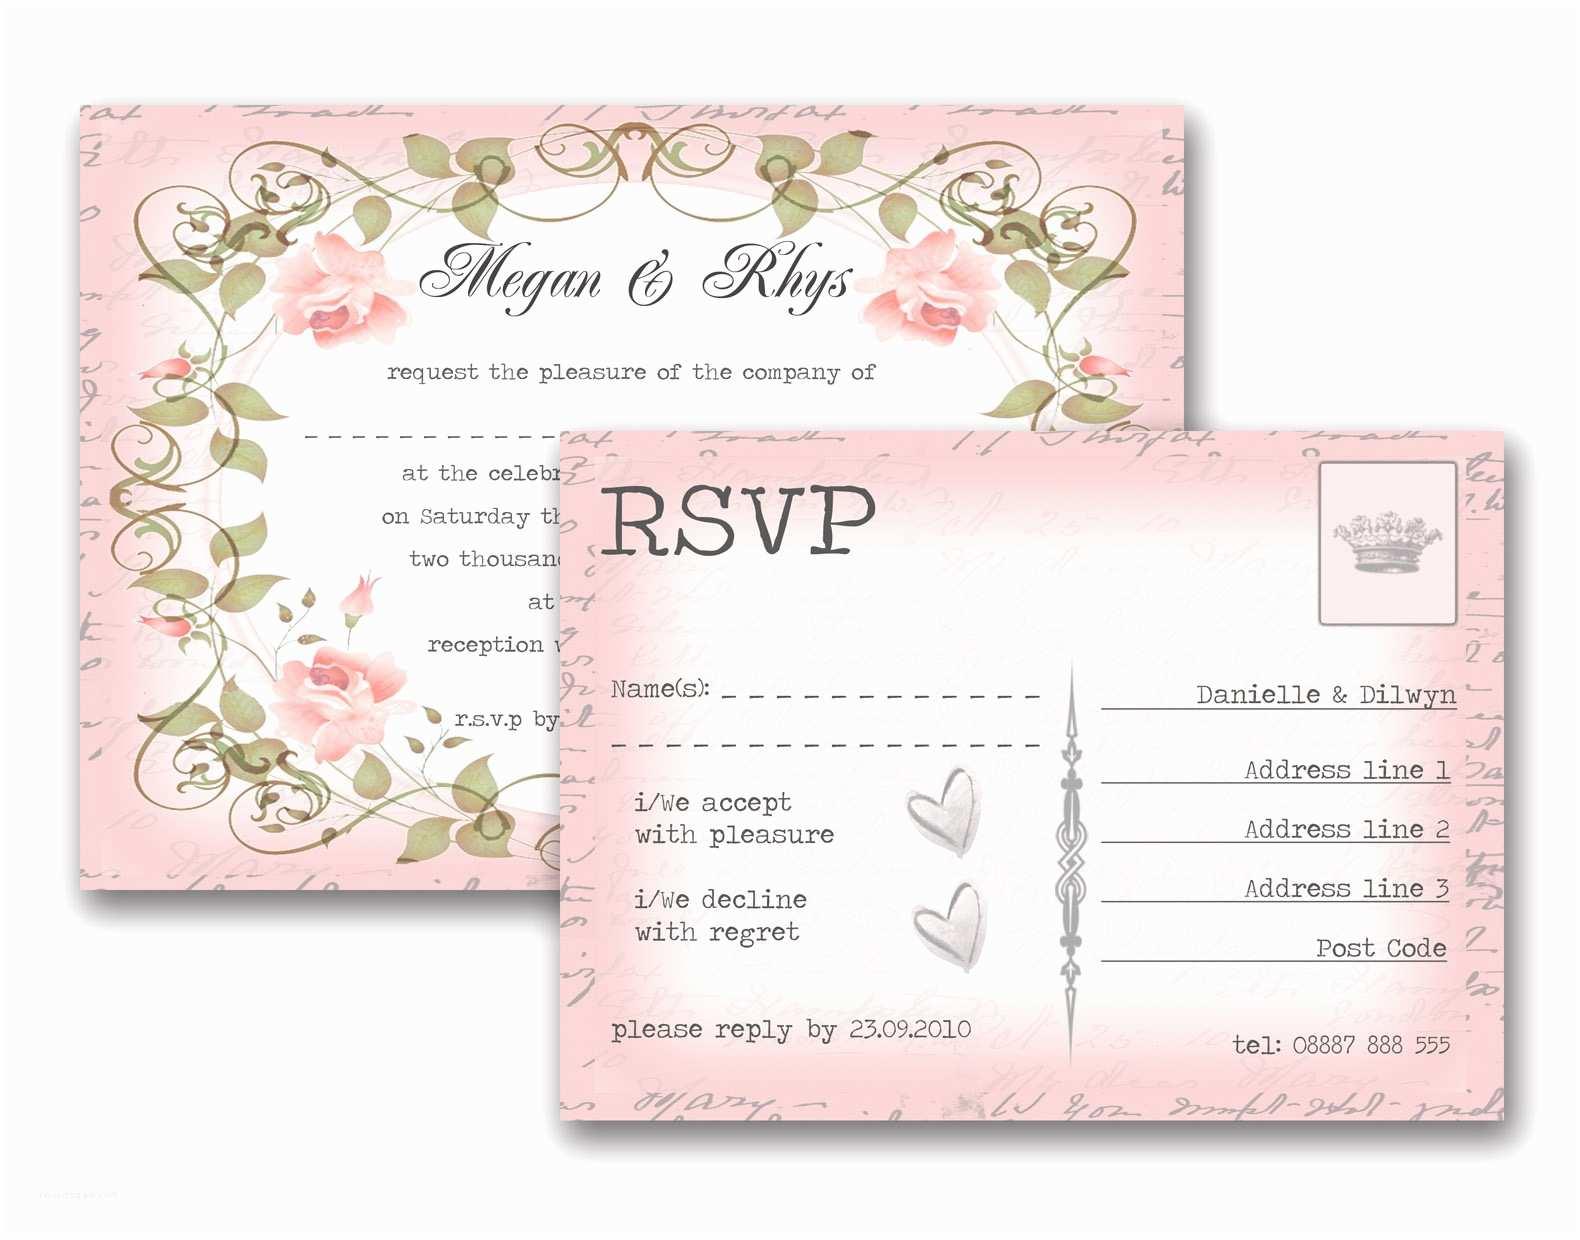 Rsvp Wedding Invitation Invitations Endearing Rsvp Wedding Cards Inspirations